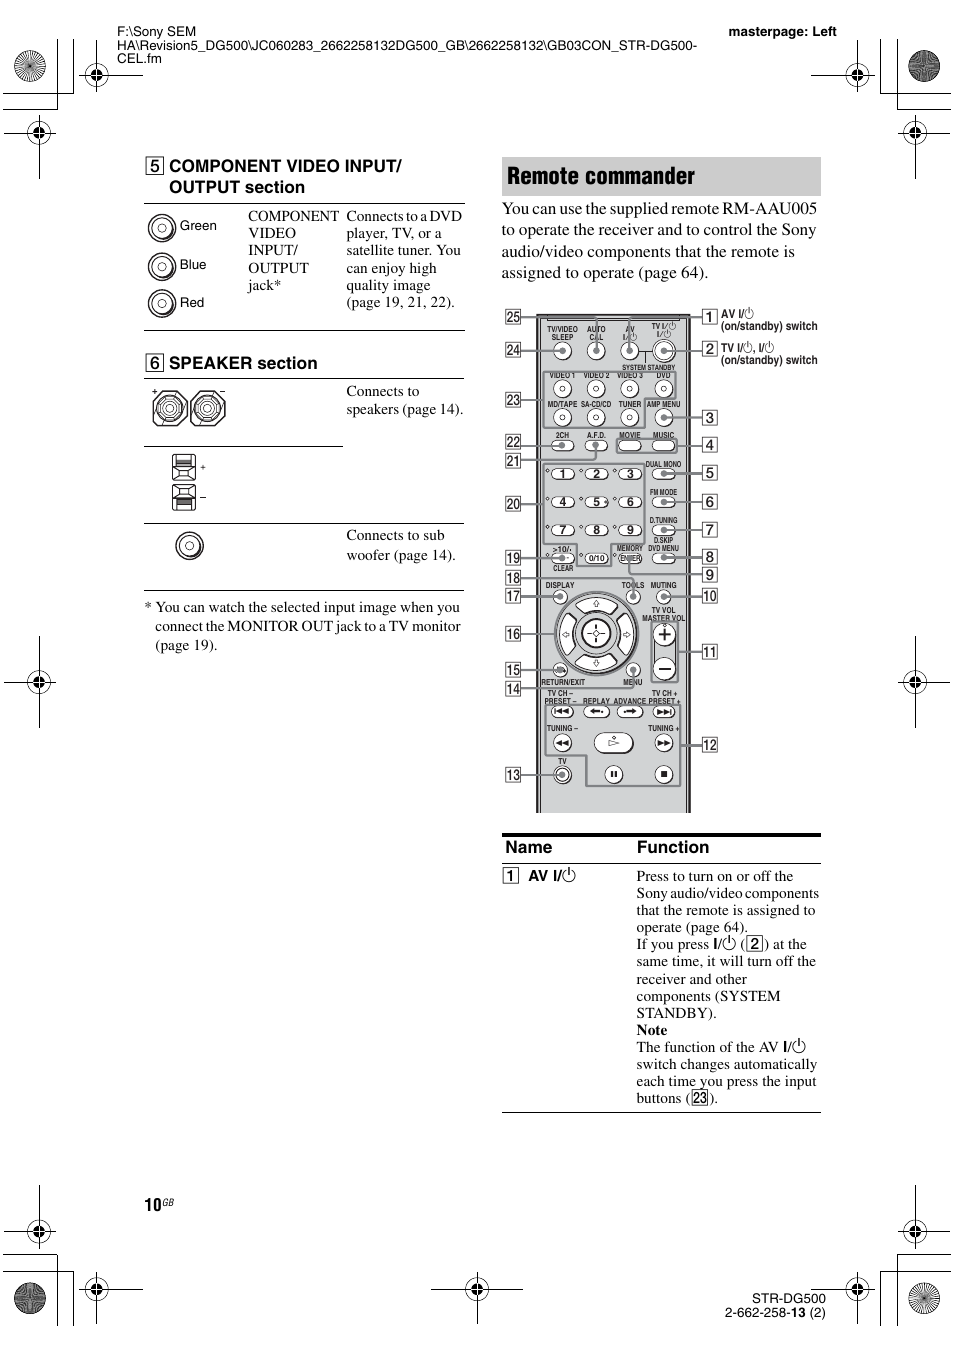 remote commander name function sony str dg500 user manual page rh manualsdir com Sony STR-DG500 Back Sony Receiver STR-DG500 Manual